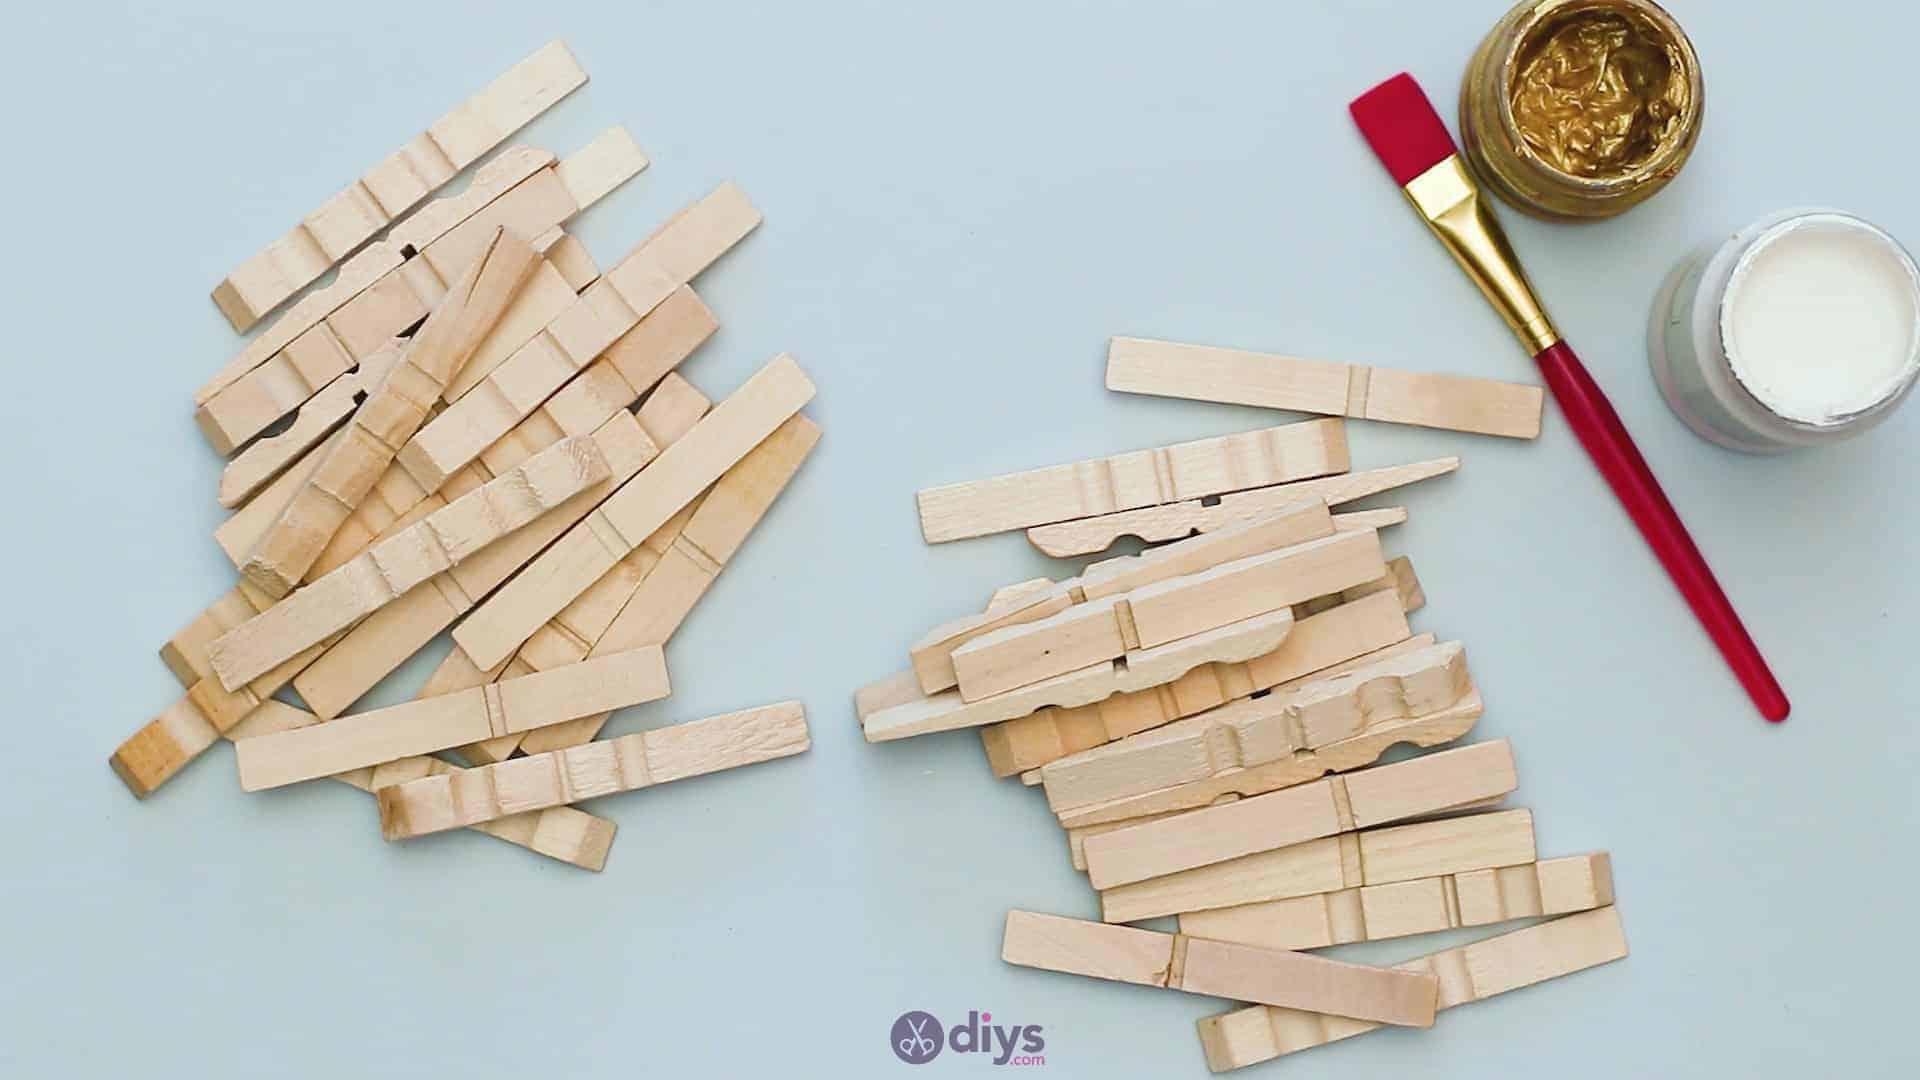 Diy clothespin art step 1f